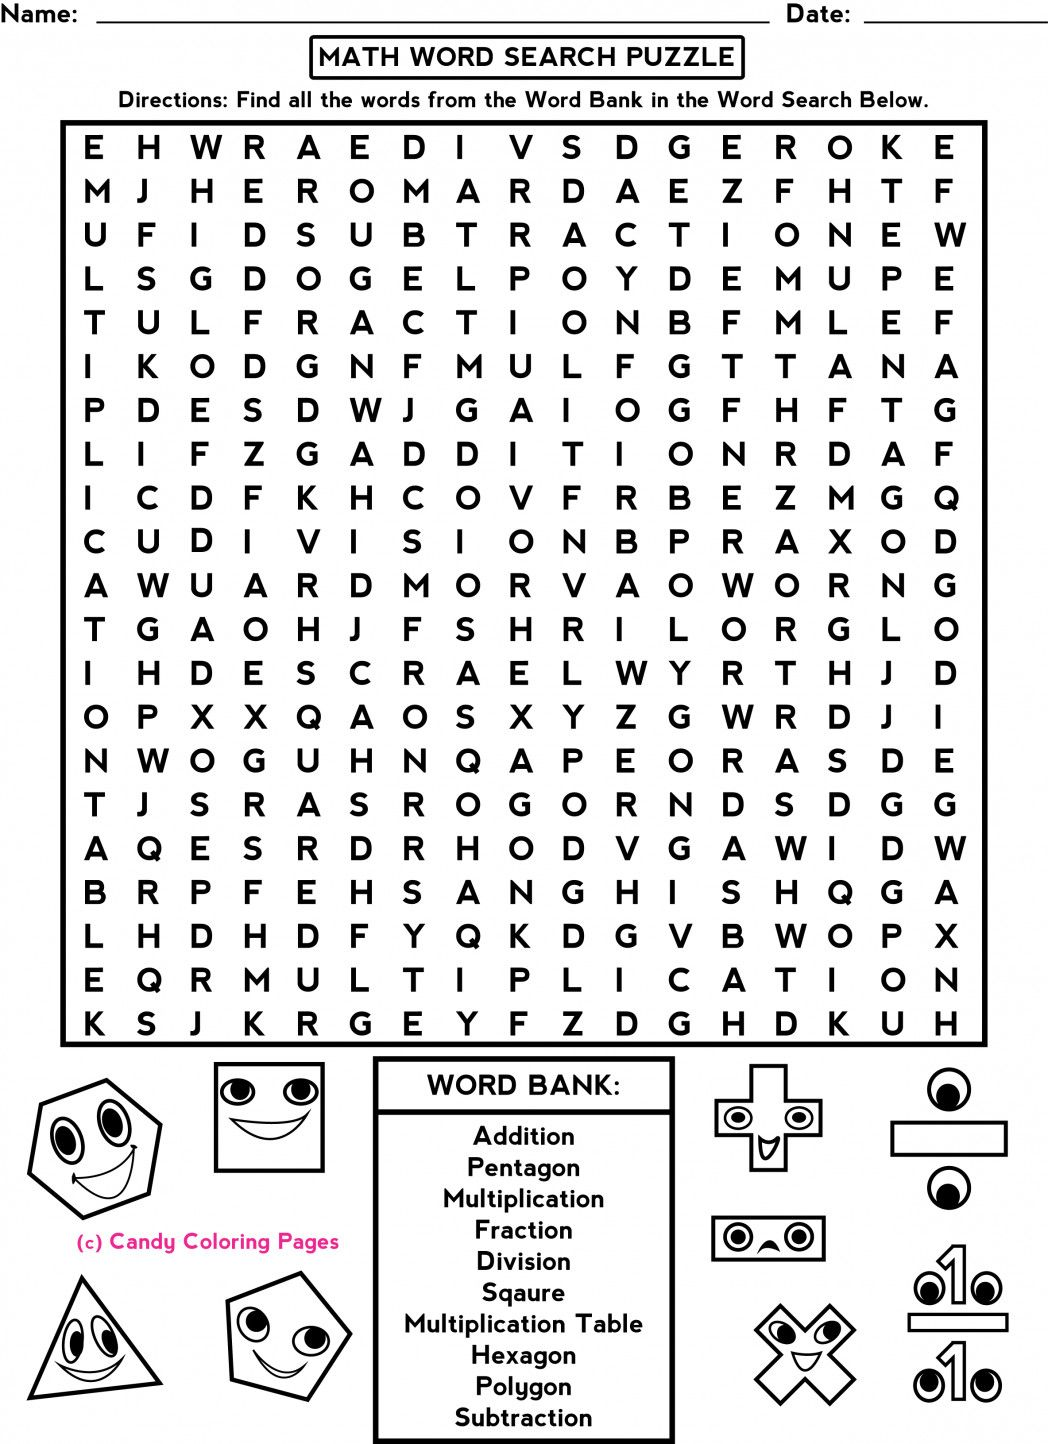 2 Math Puzzle Worksheet Printable 001 In